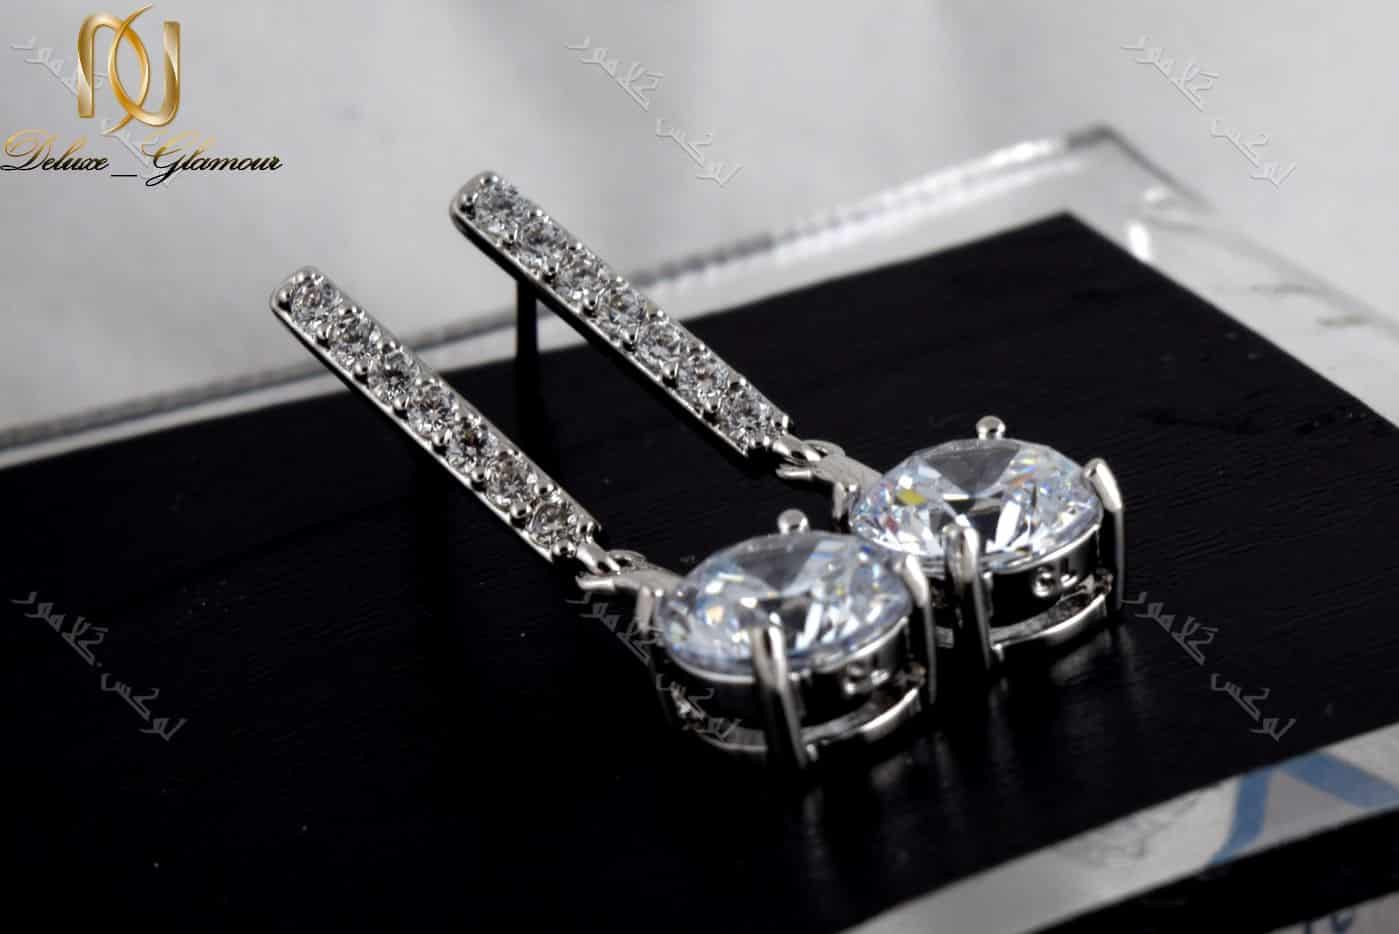 گوشواره آویزی جواهری کلیو با کریستالهای سواروفسکی. عکس با زمینه مشکی